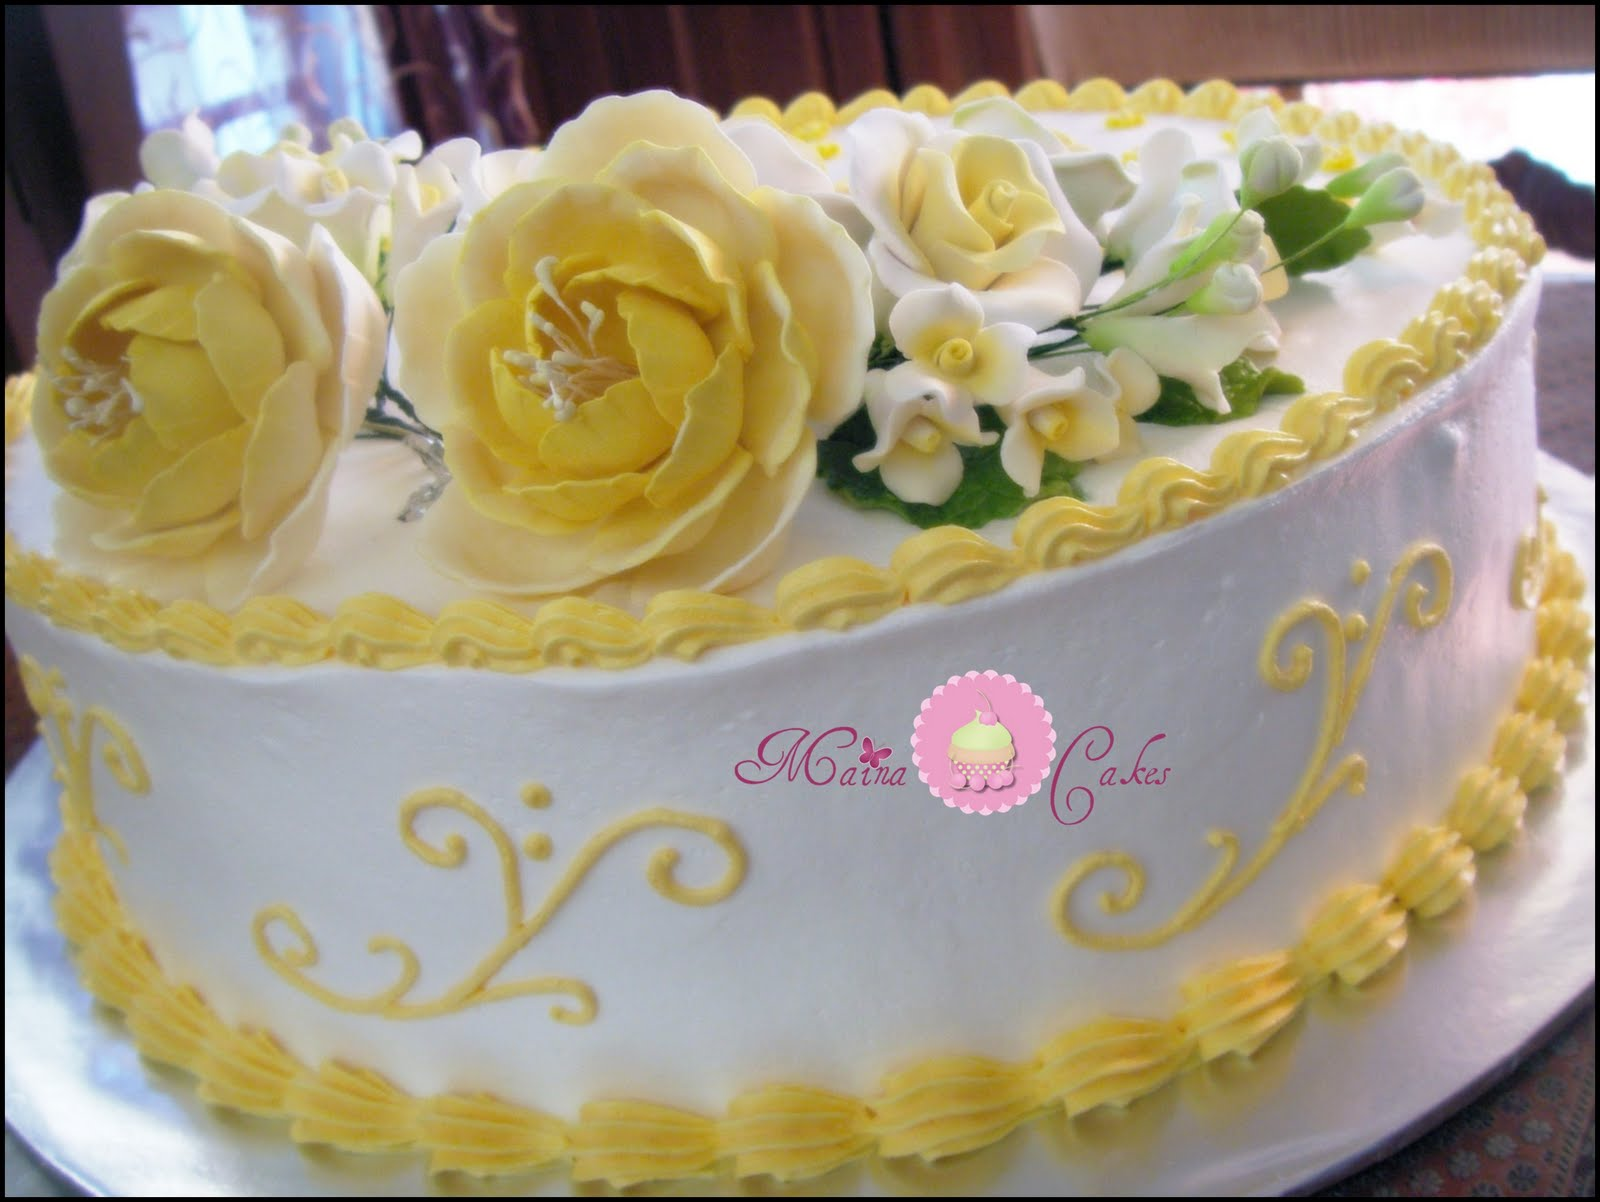 Cake Images With Name Kamal : Maina Cakes: :: 28MAY AIN & KAMAL